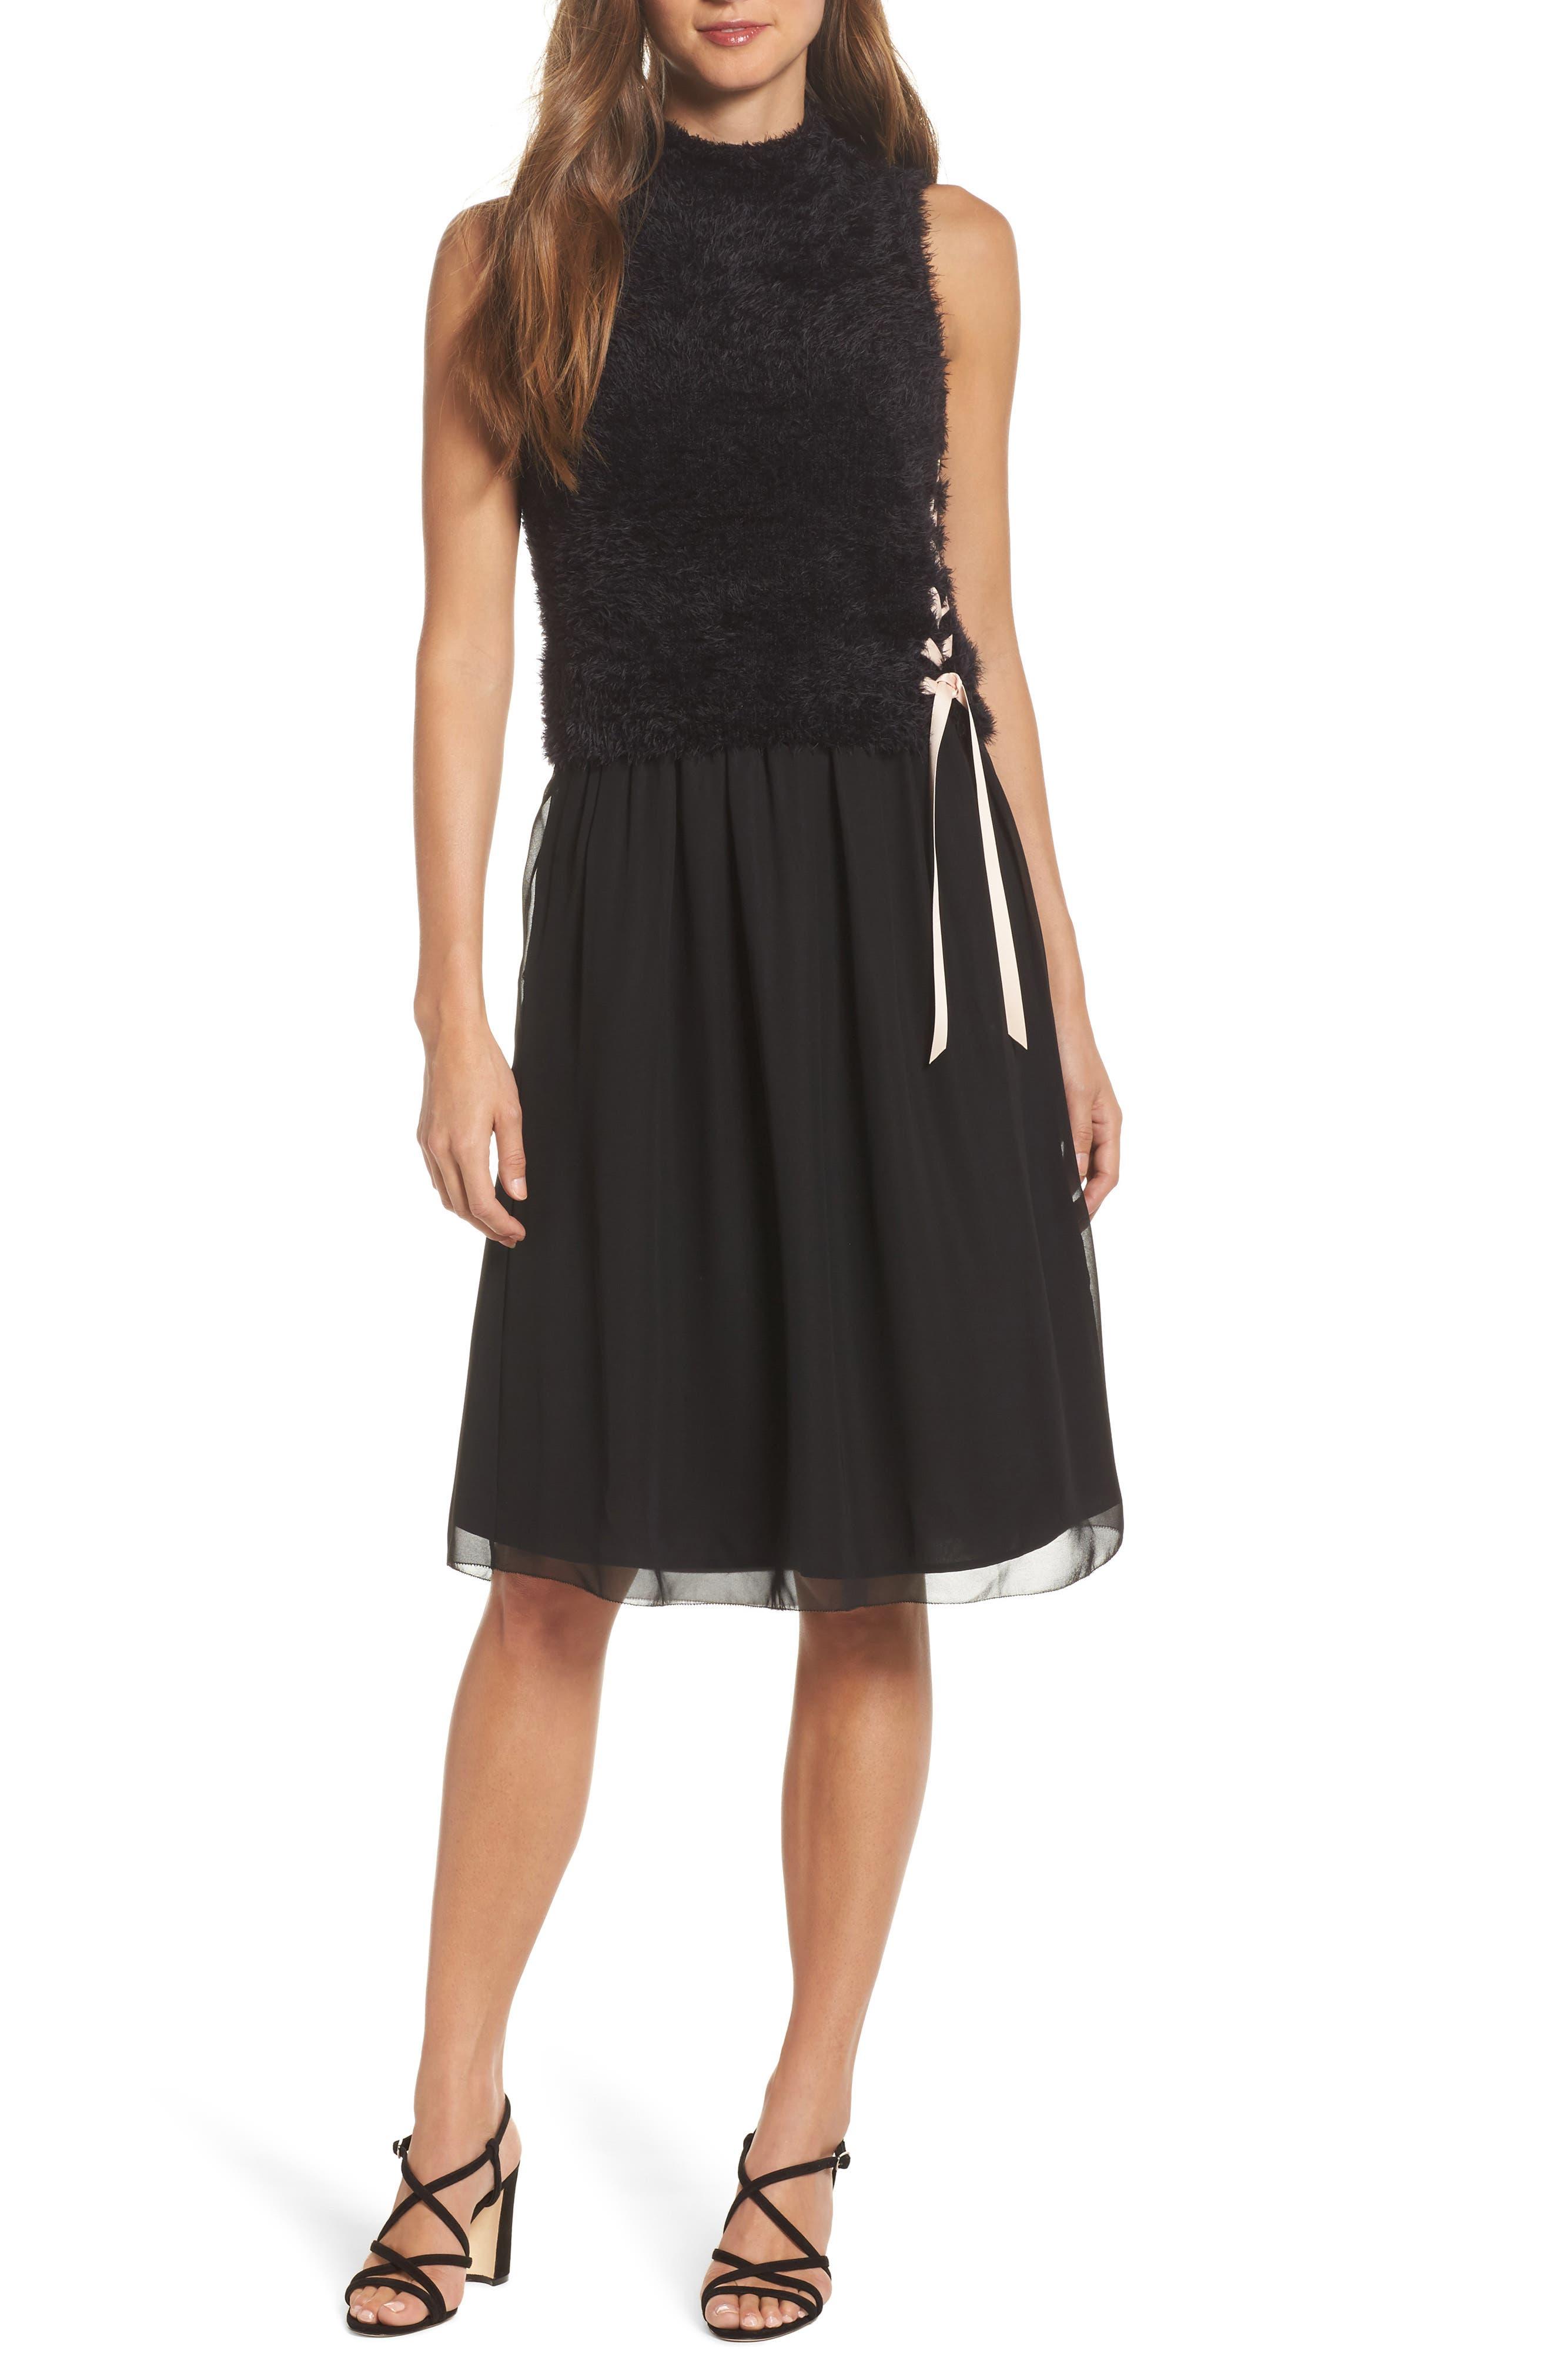 Main Image - NIC + ZOE Lace-Up Dress